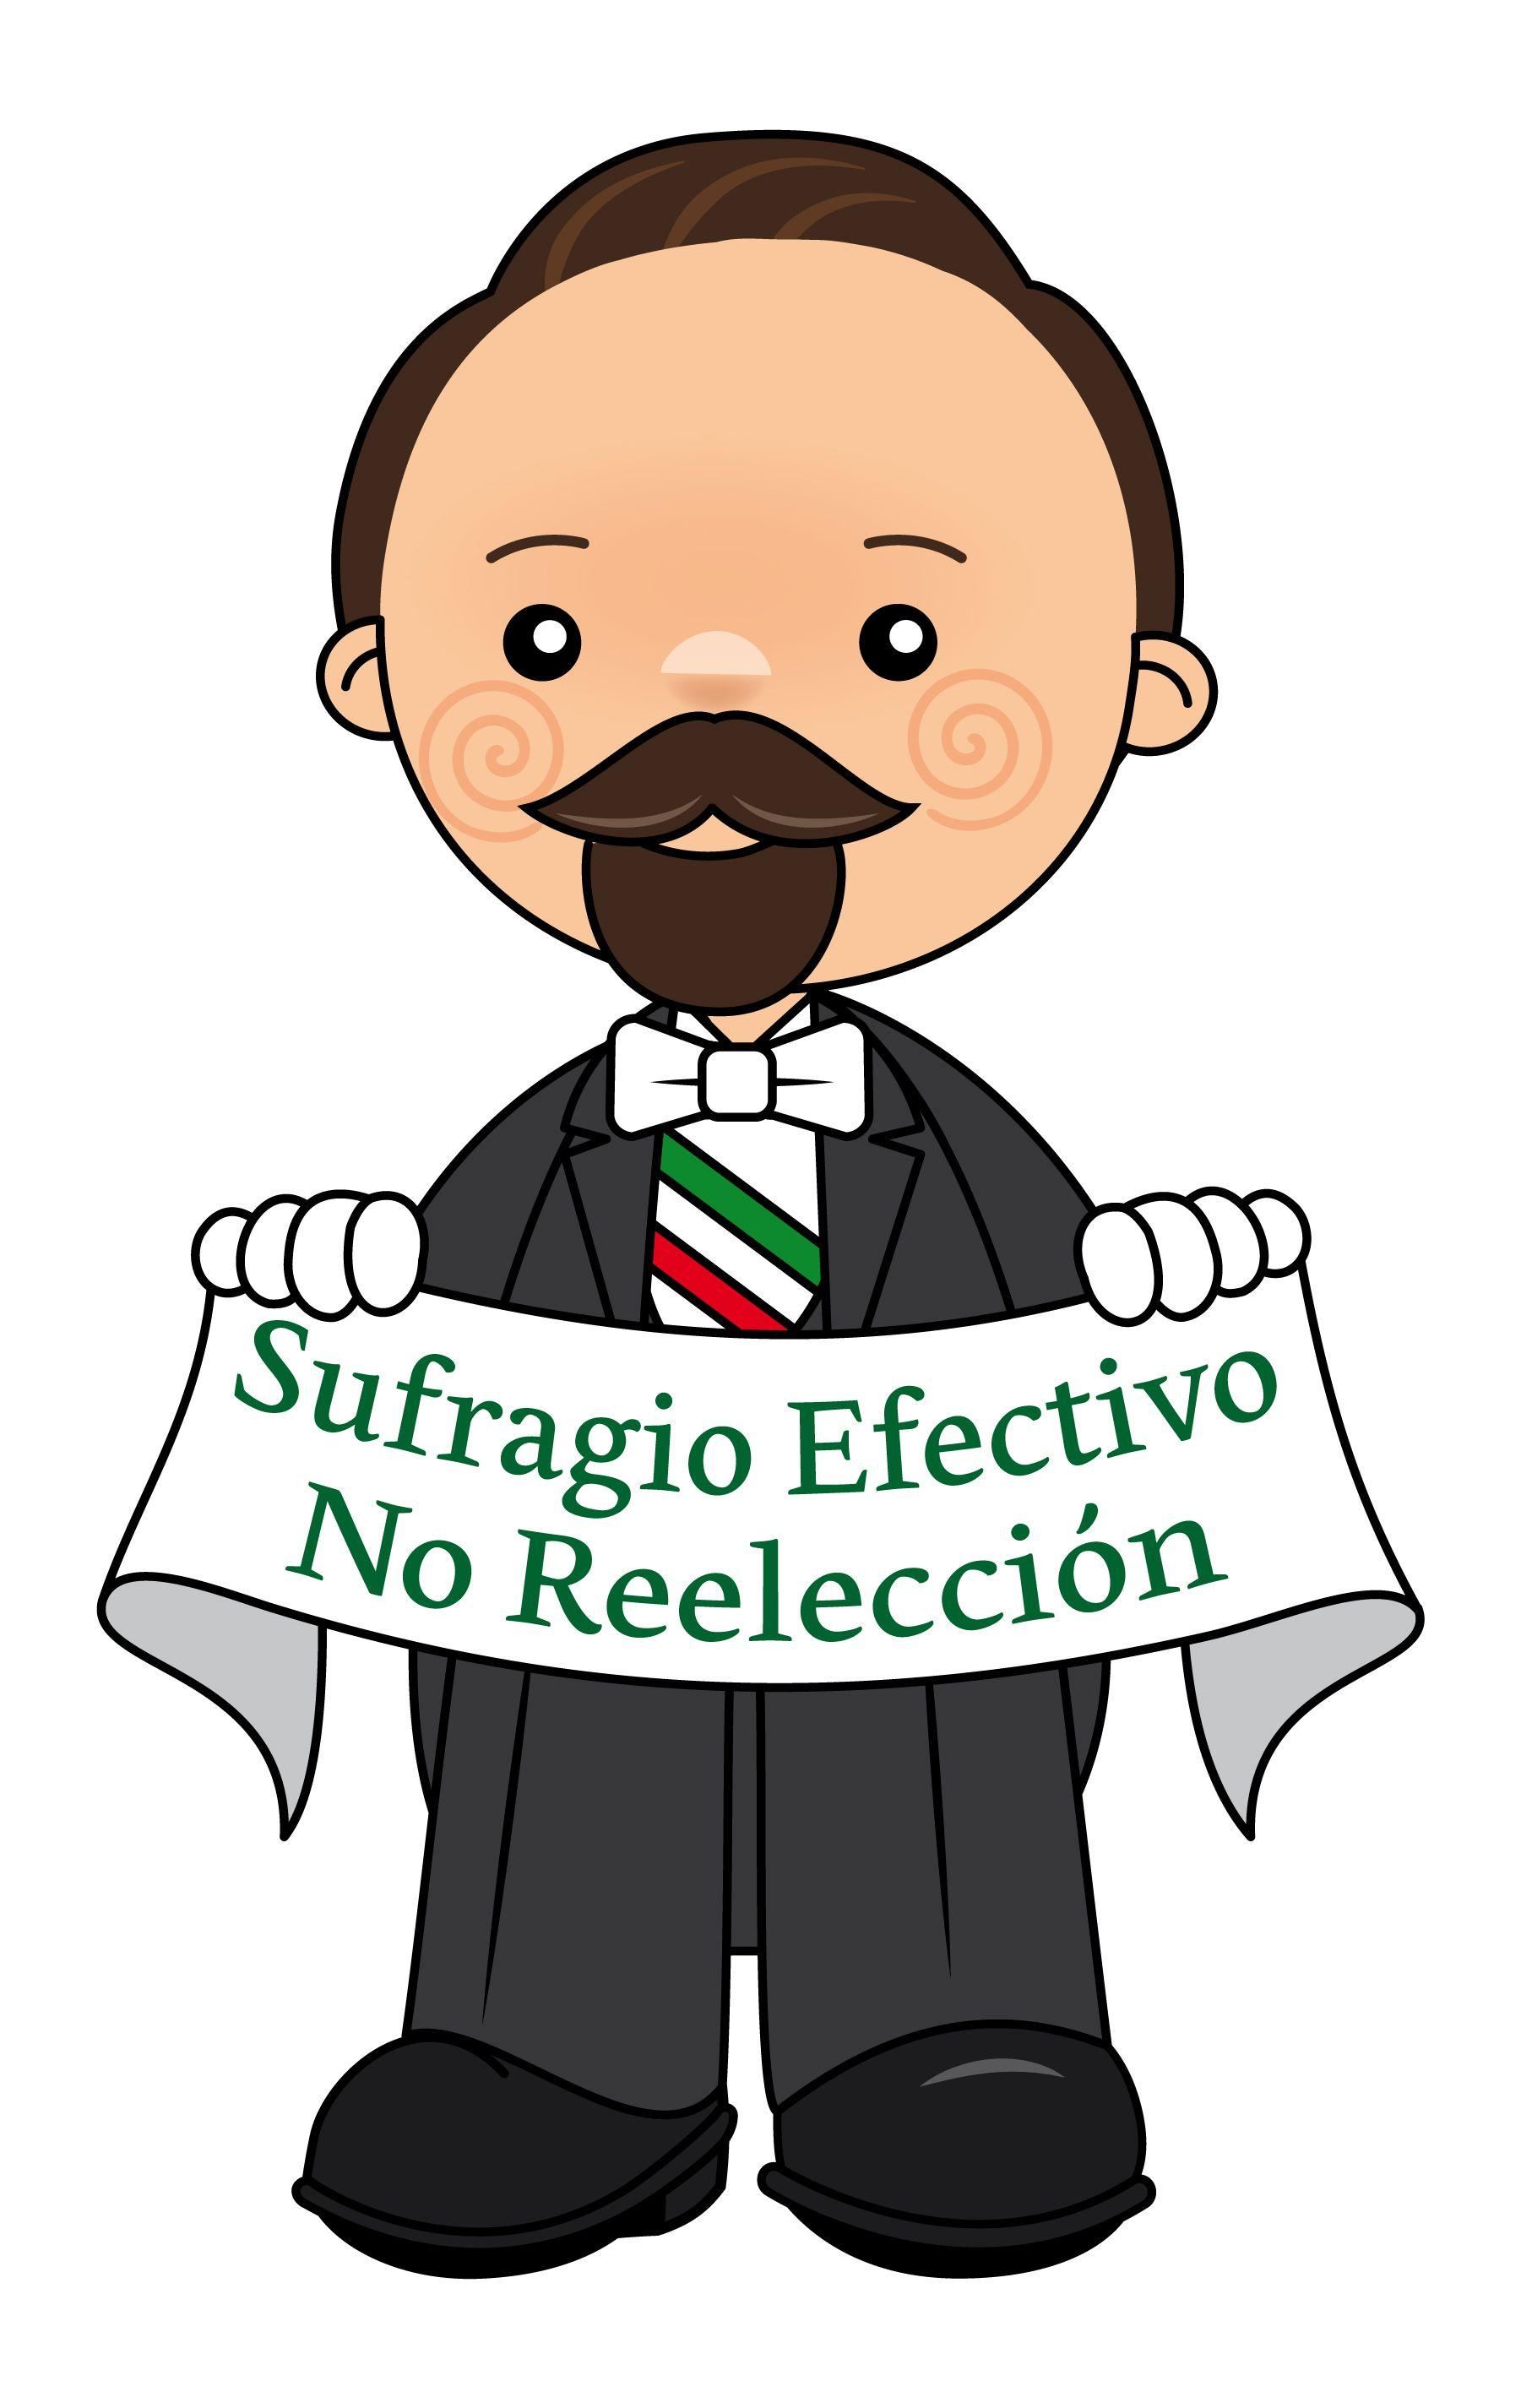 Francisco I Madero Revolucion Mexicana Para Ninos Revolucion Mexicana Dibujos Personajes De Dibujos Animados Clasicos